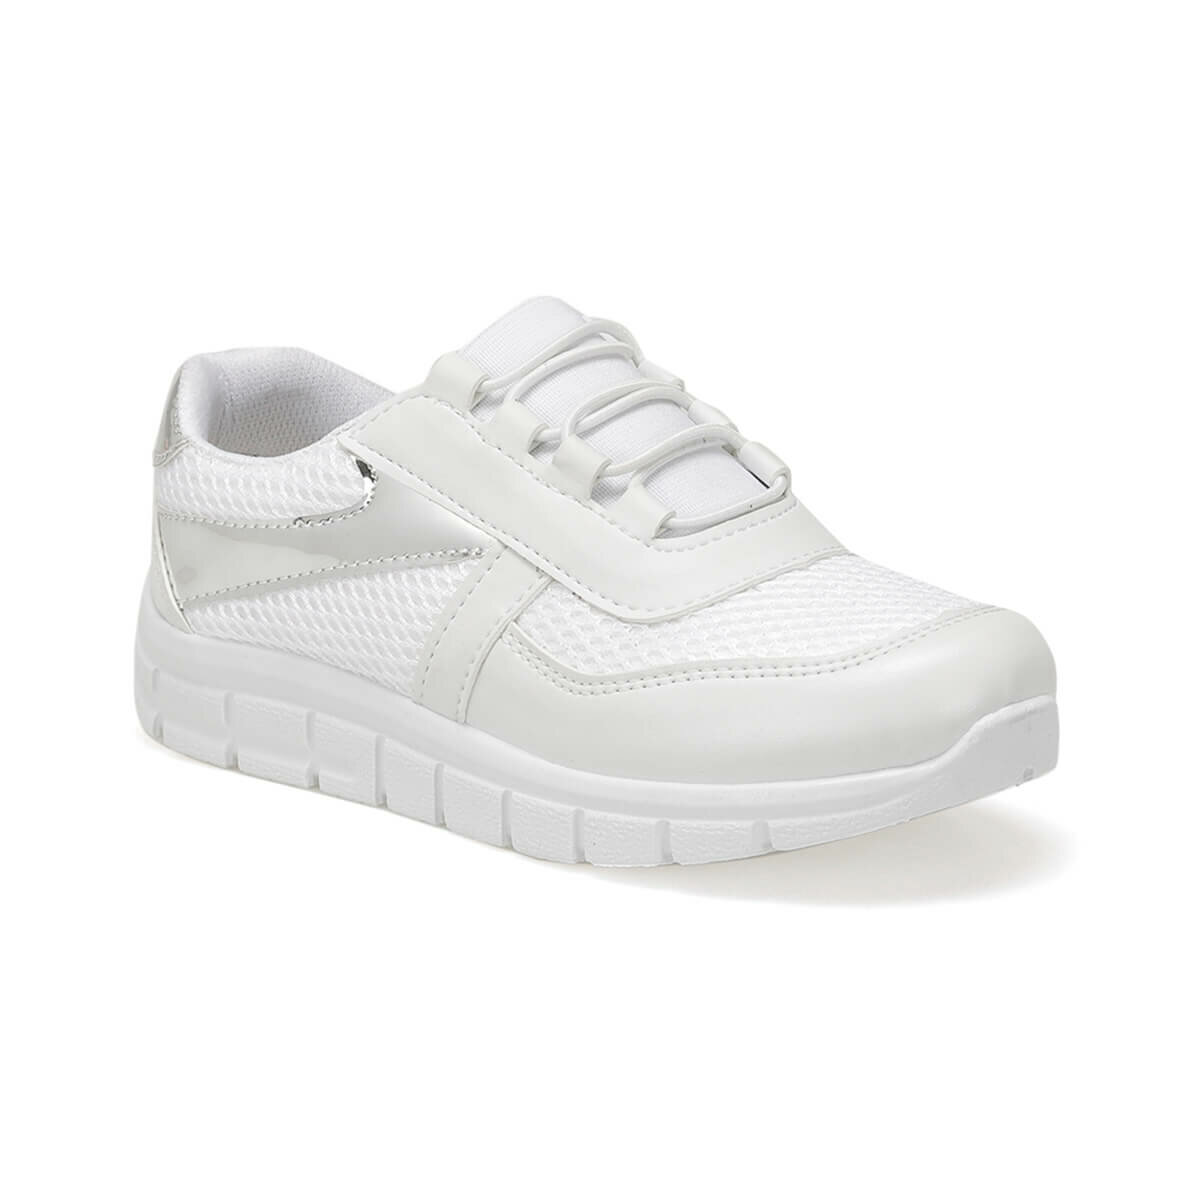 FLO SILVIA White Female Child Sneaker Shoes I-Cool